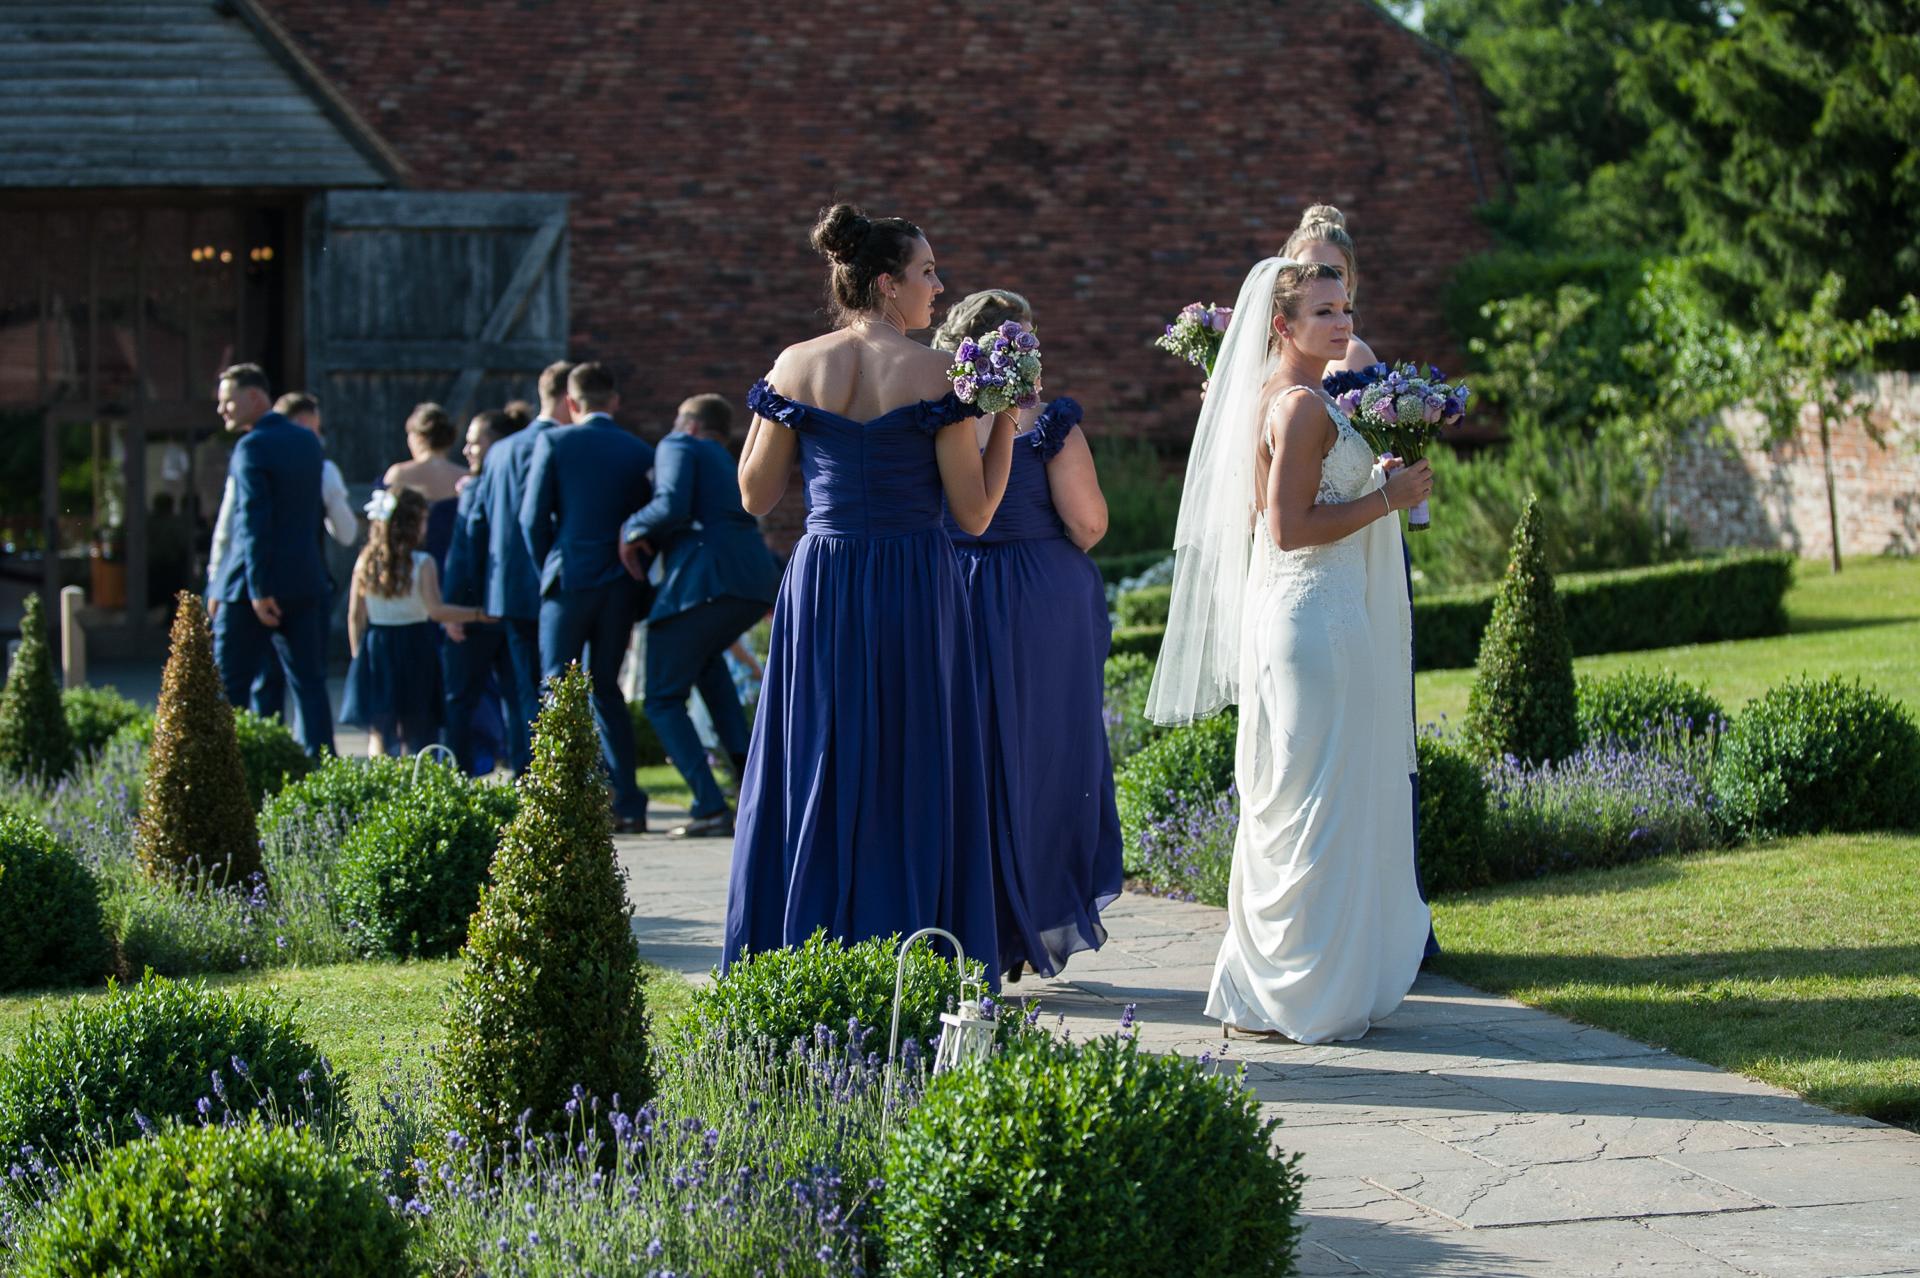 Ufton Court Wedding Photography37.JPG